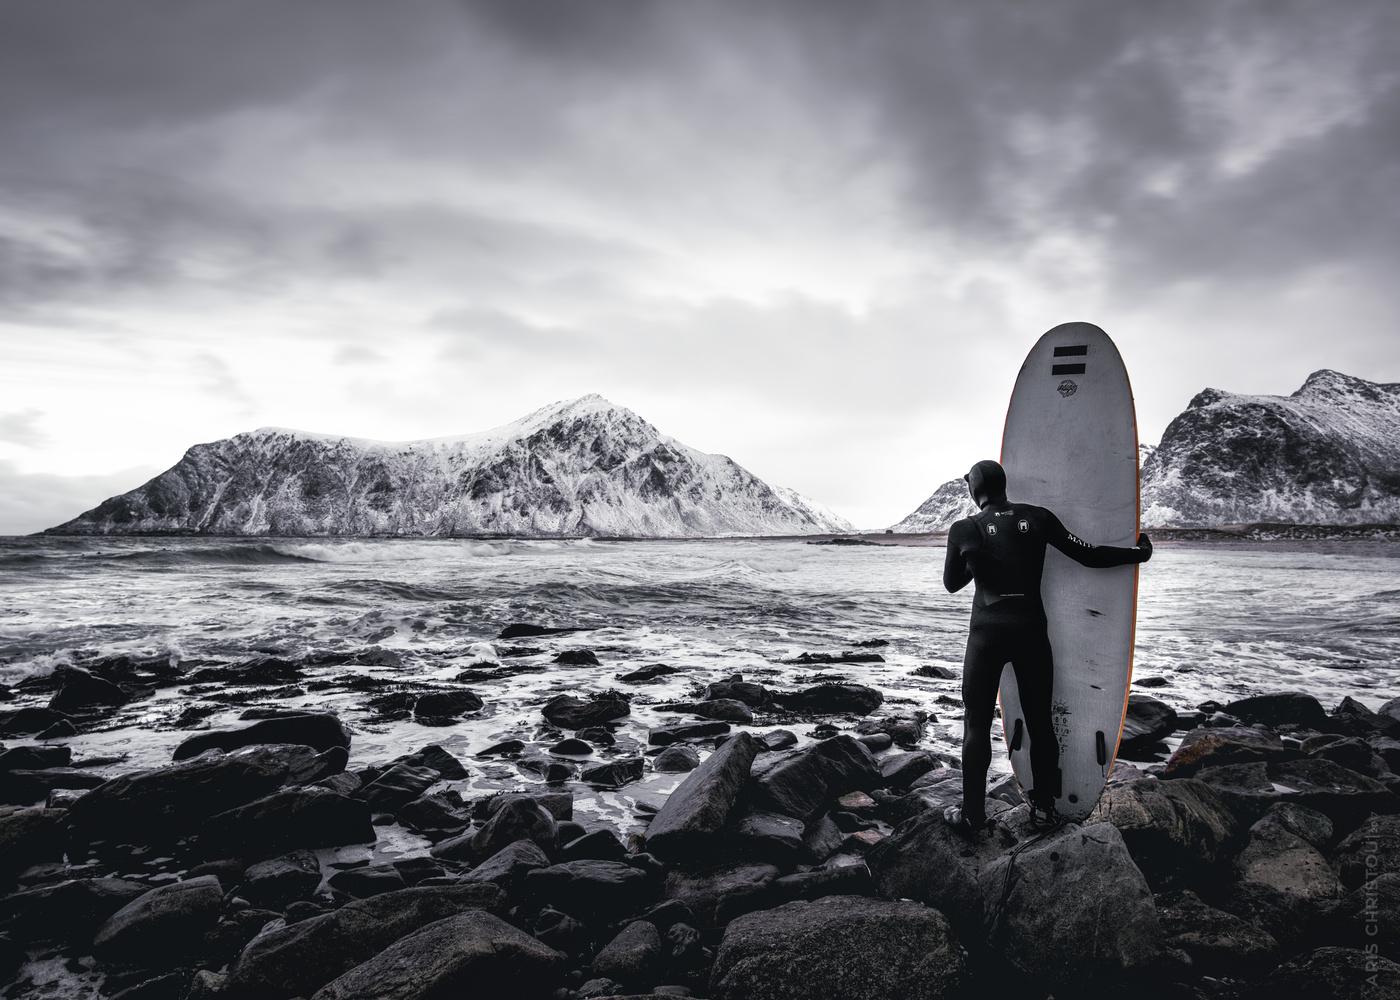 Surfer | Skagsanden Beach - Lofoten by Aris Christou